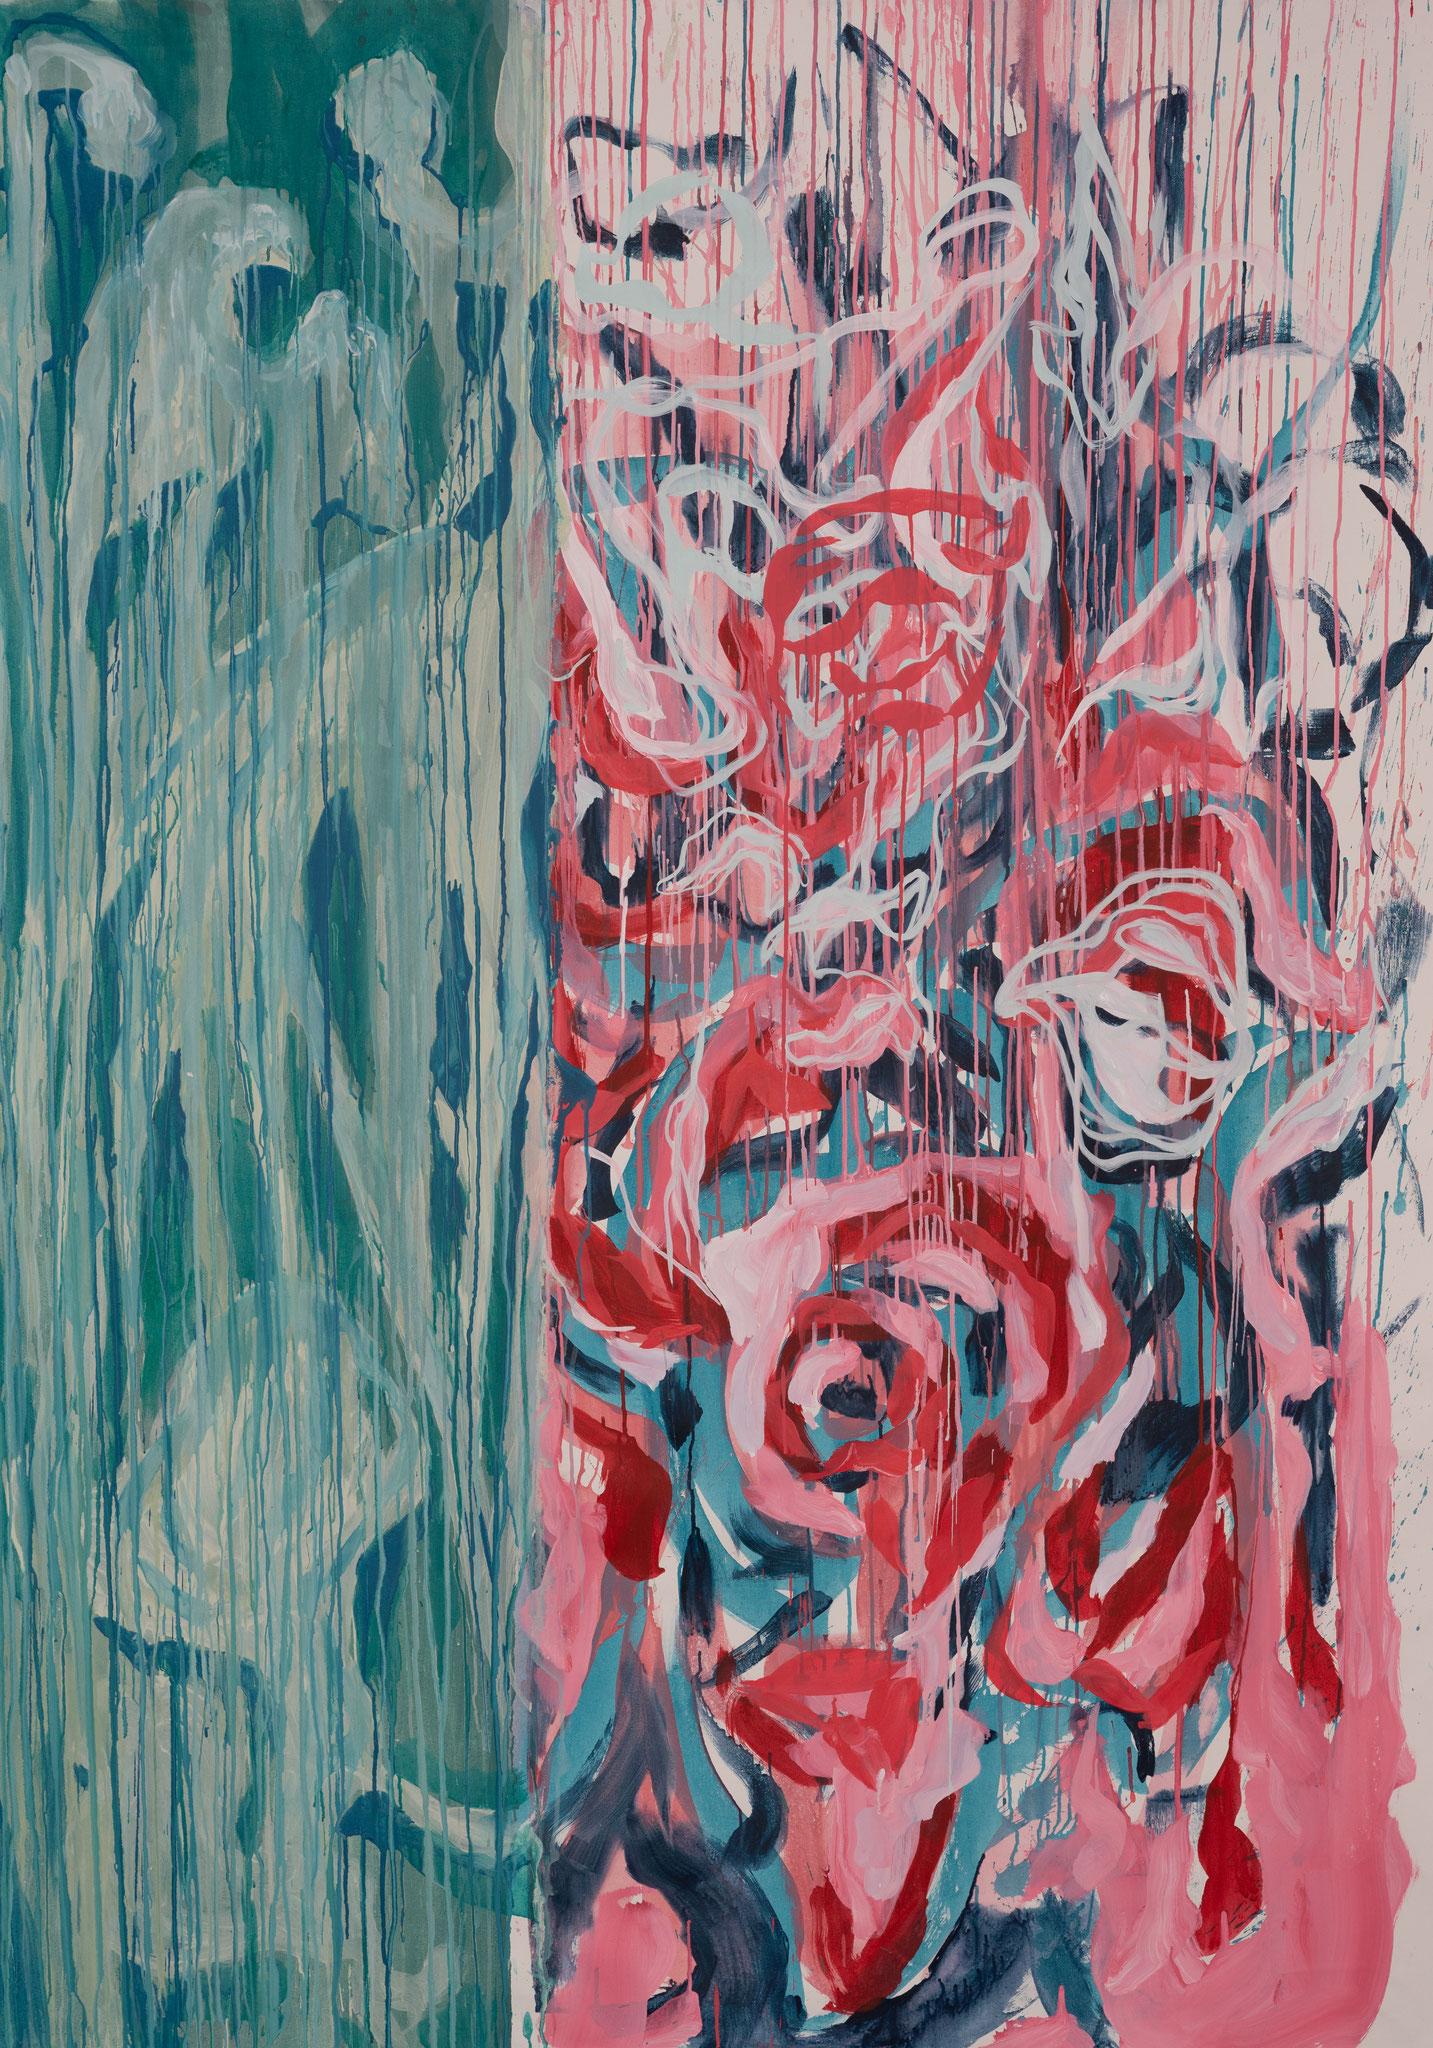 """Break"" 200 x 150 cm - Acryl auf Leinwand"